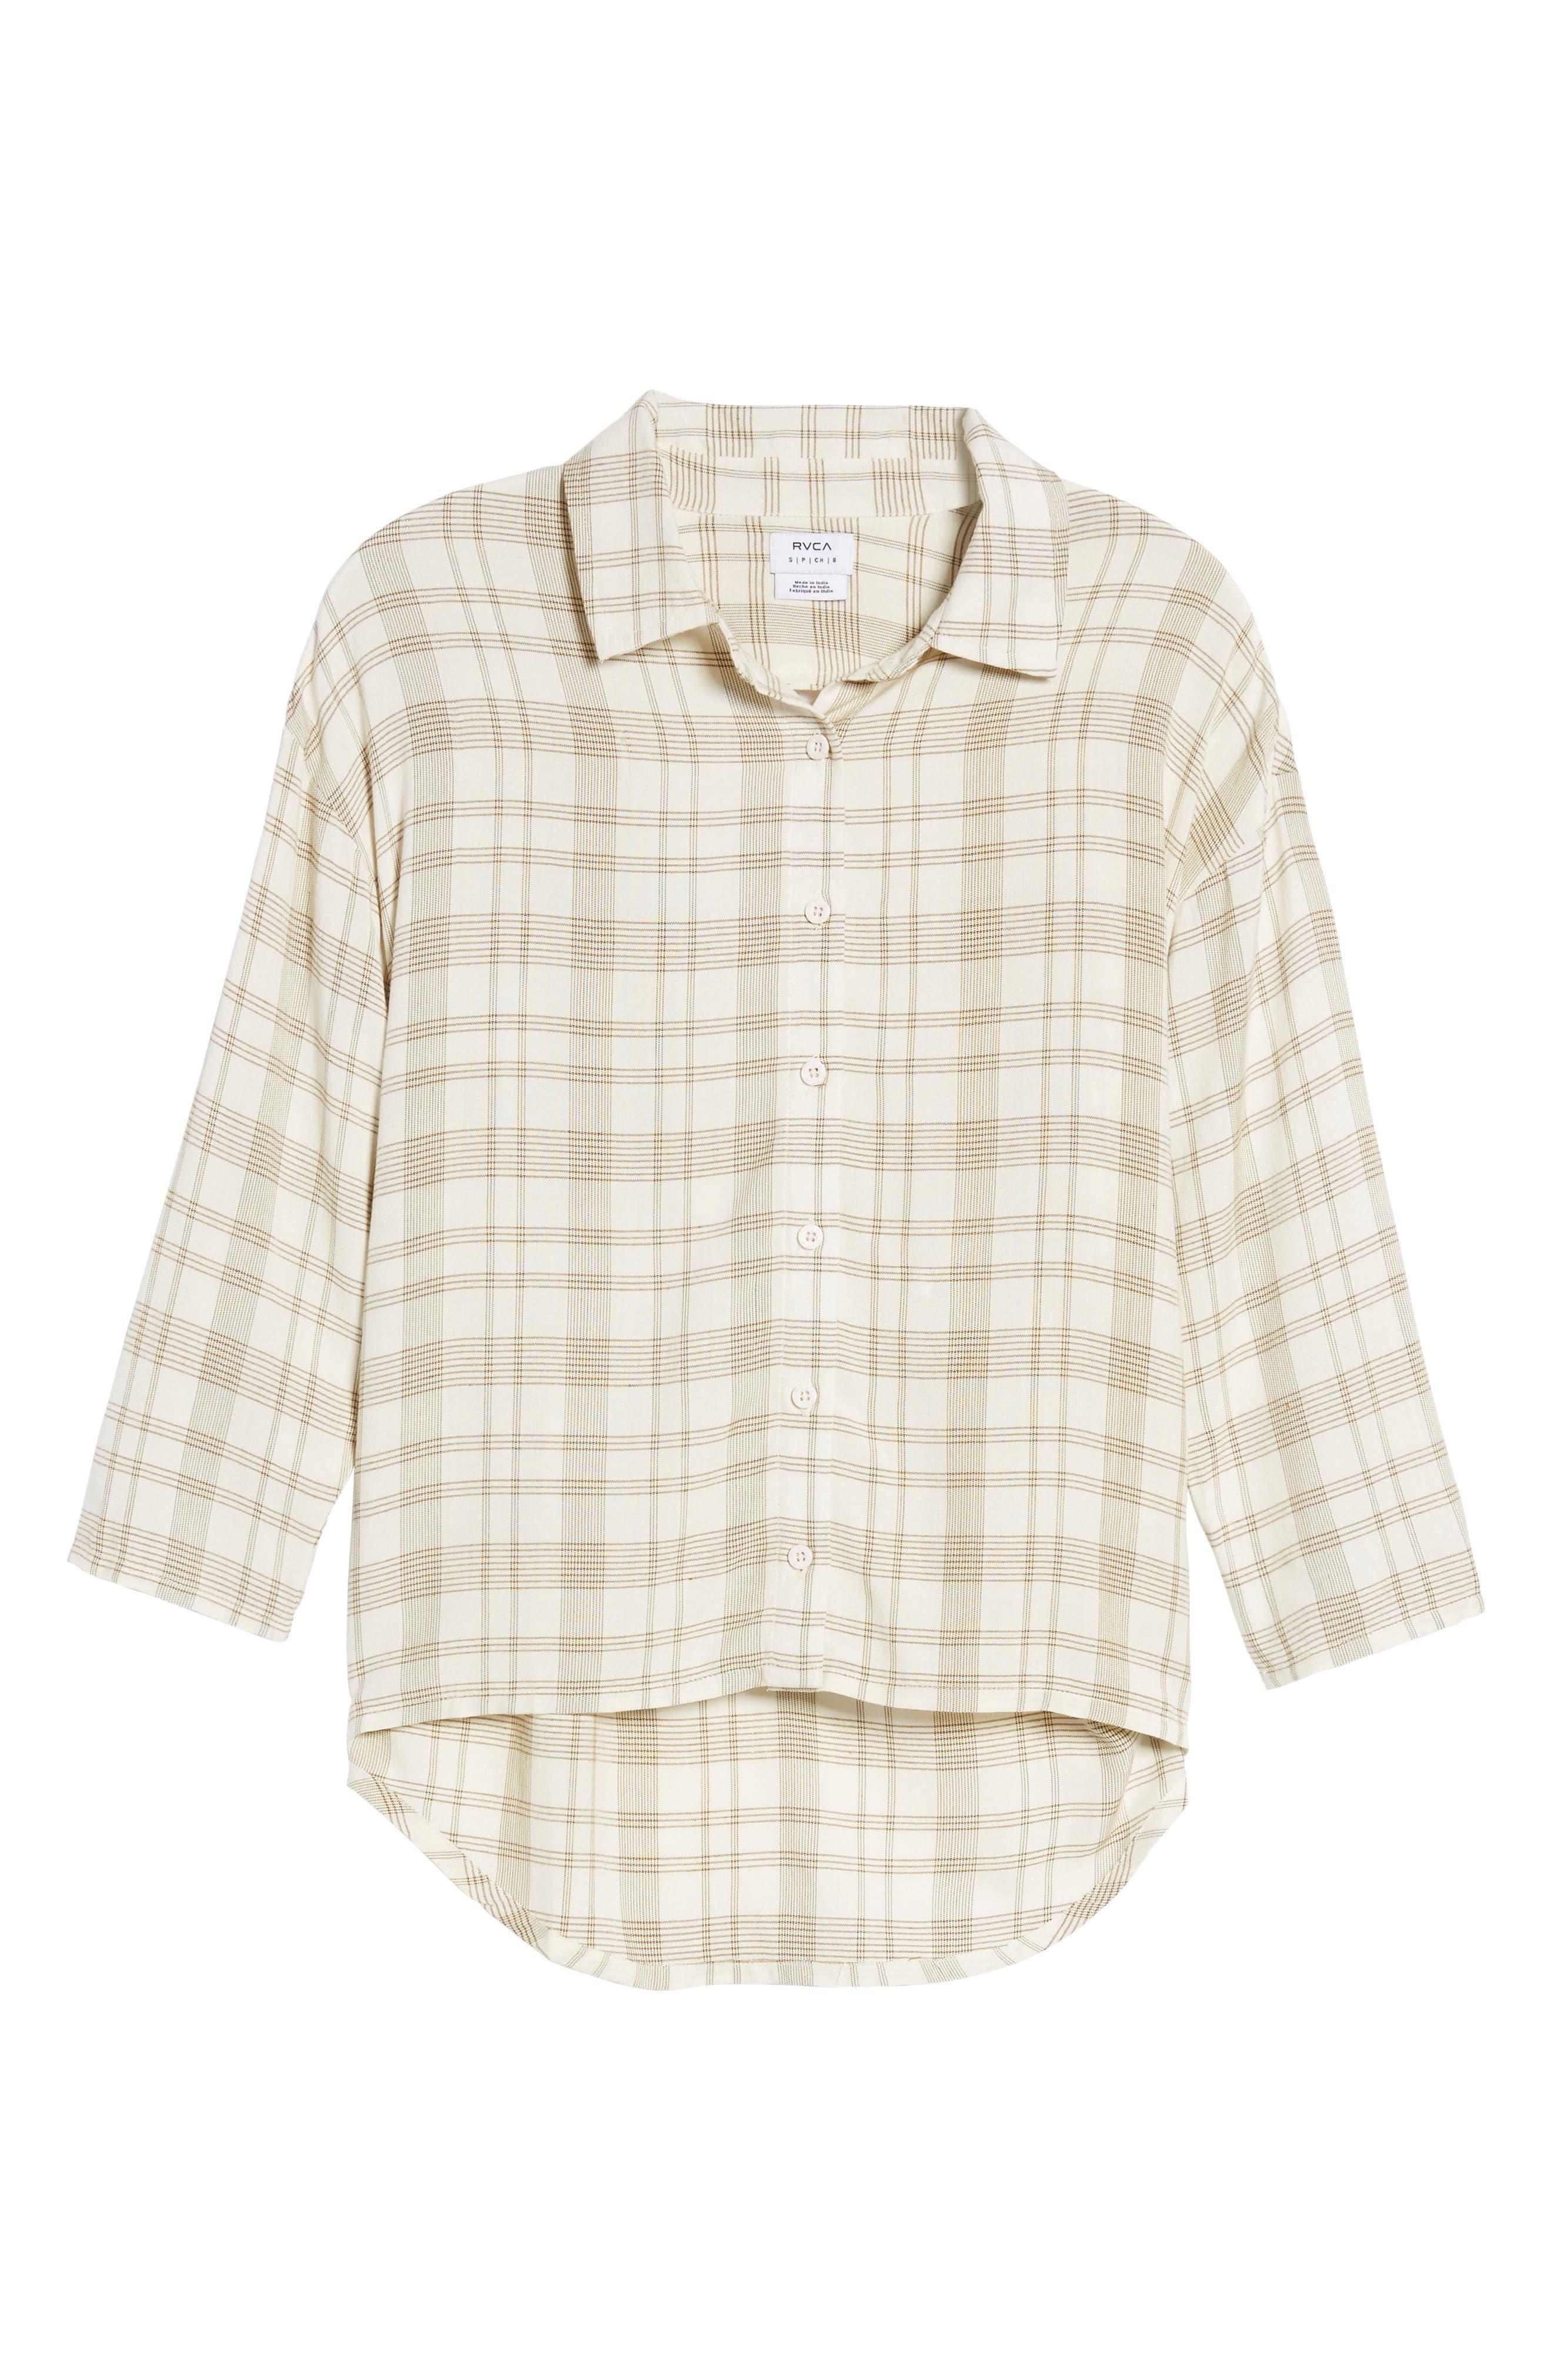 Drift Away Plaid Shirt,                             Alternate thumbnail 6, color,                             250